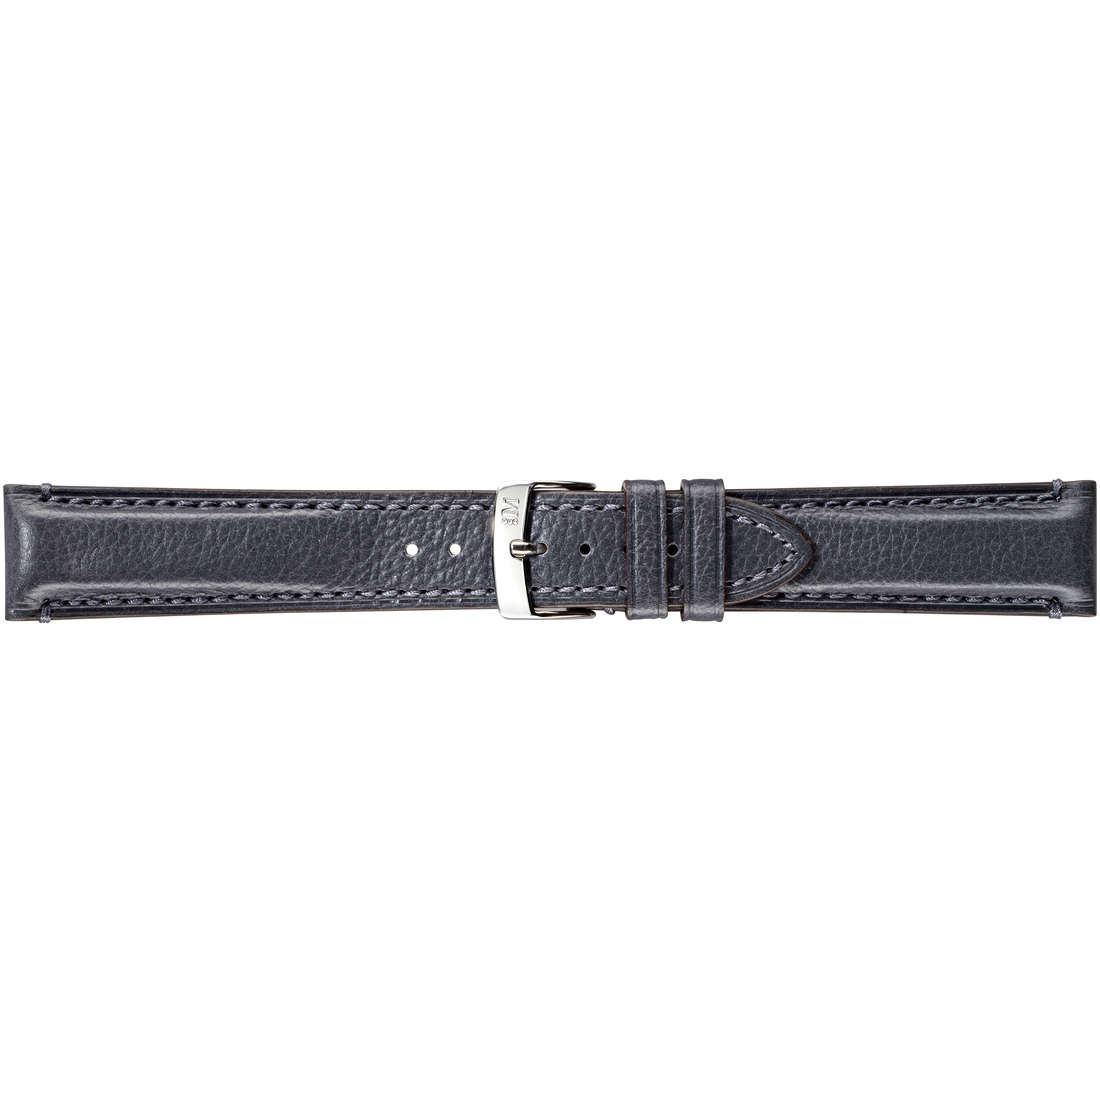 watch watch bands watch straps man Morellato Manufatti A01X4684B73092CR22